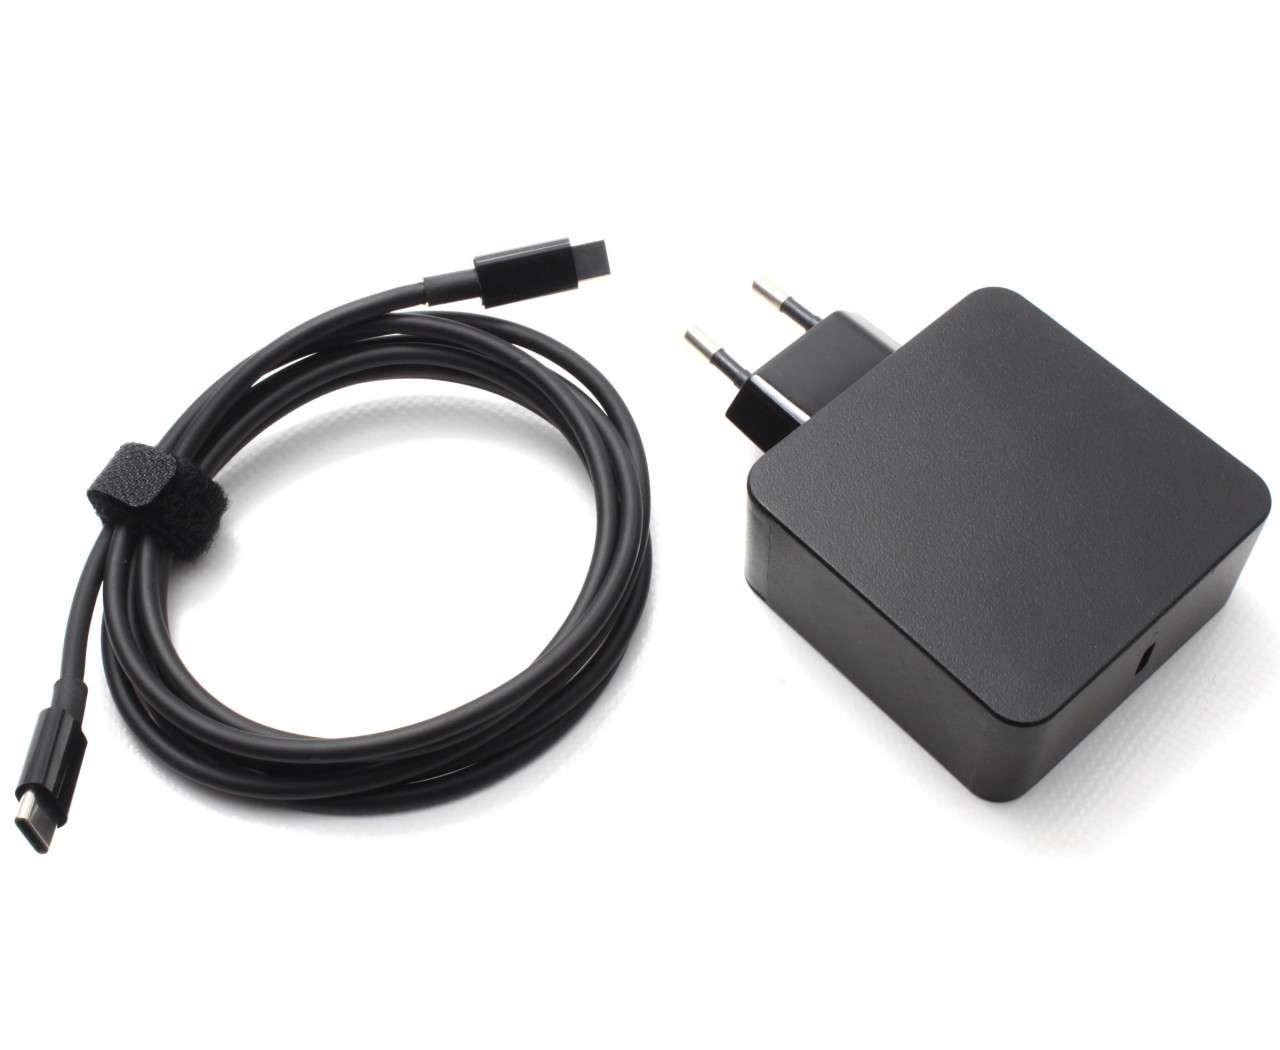 Incarcator HP Spectre X363 13-AE013DX 65W imagine powerlaptop.ro 2021